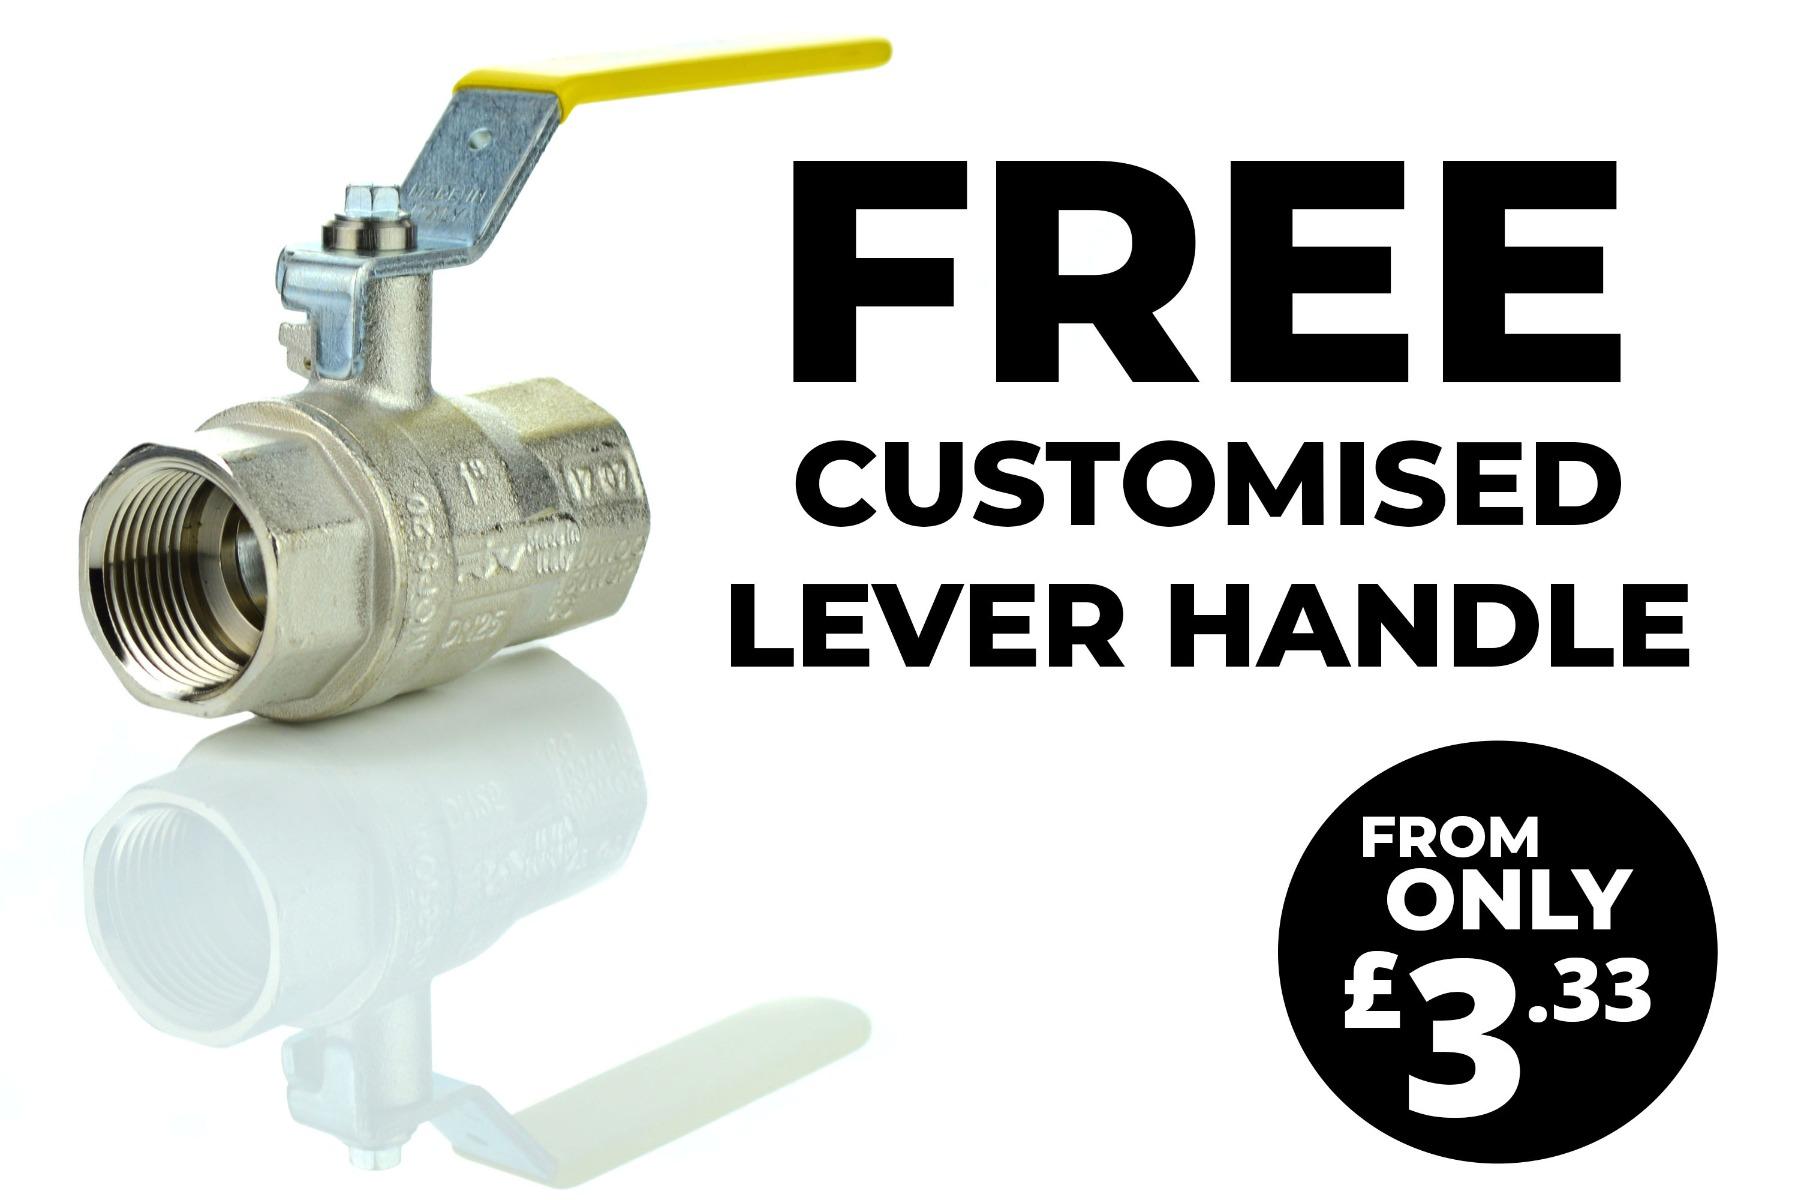 Free Custom Lever Handle